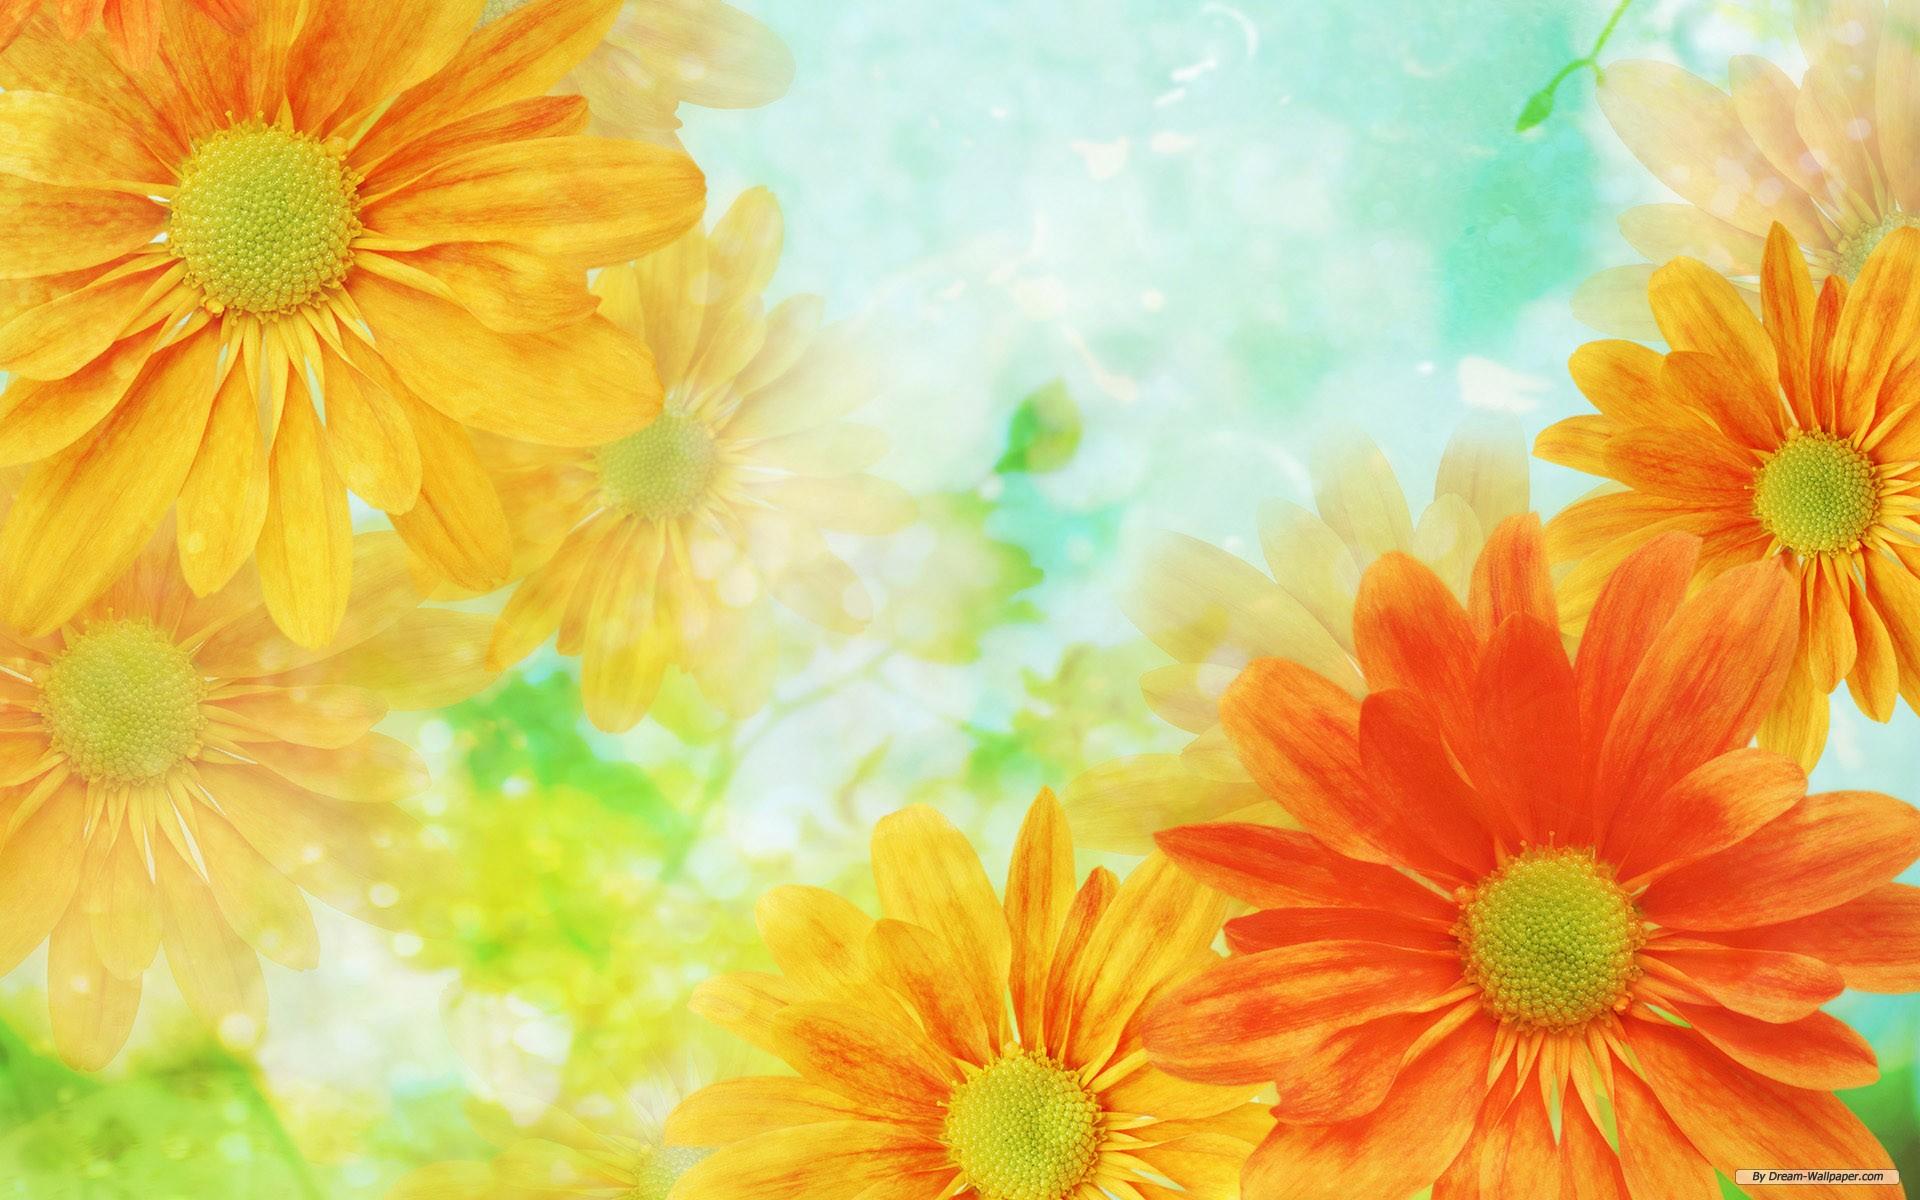 Download. Description wallpaper: Flower Backgrounds ...